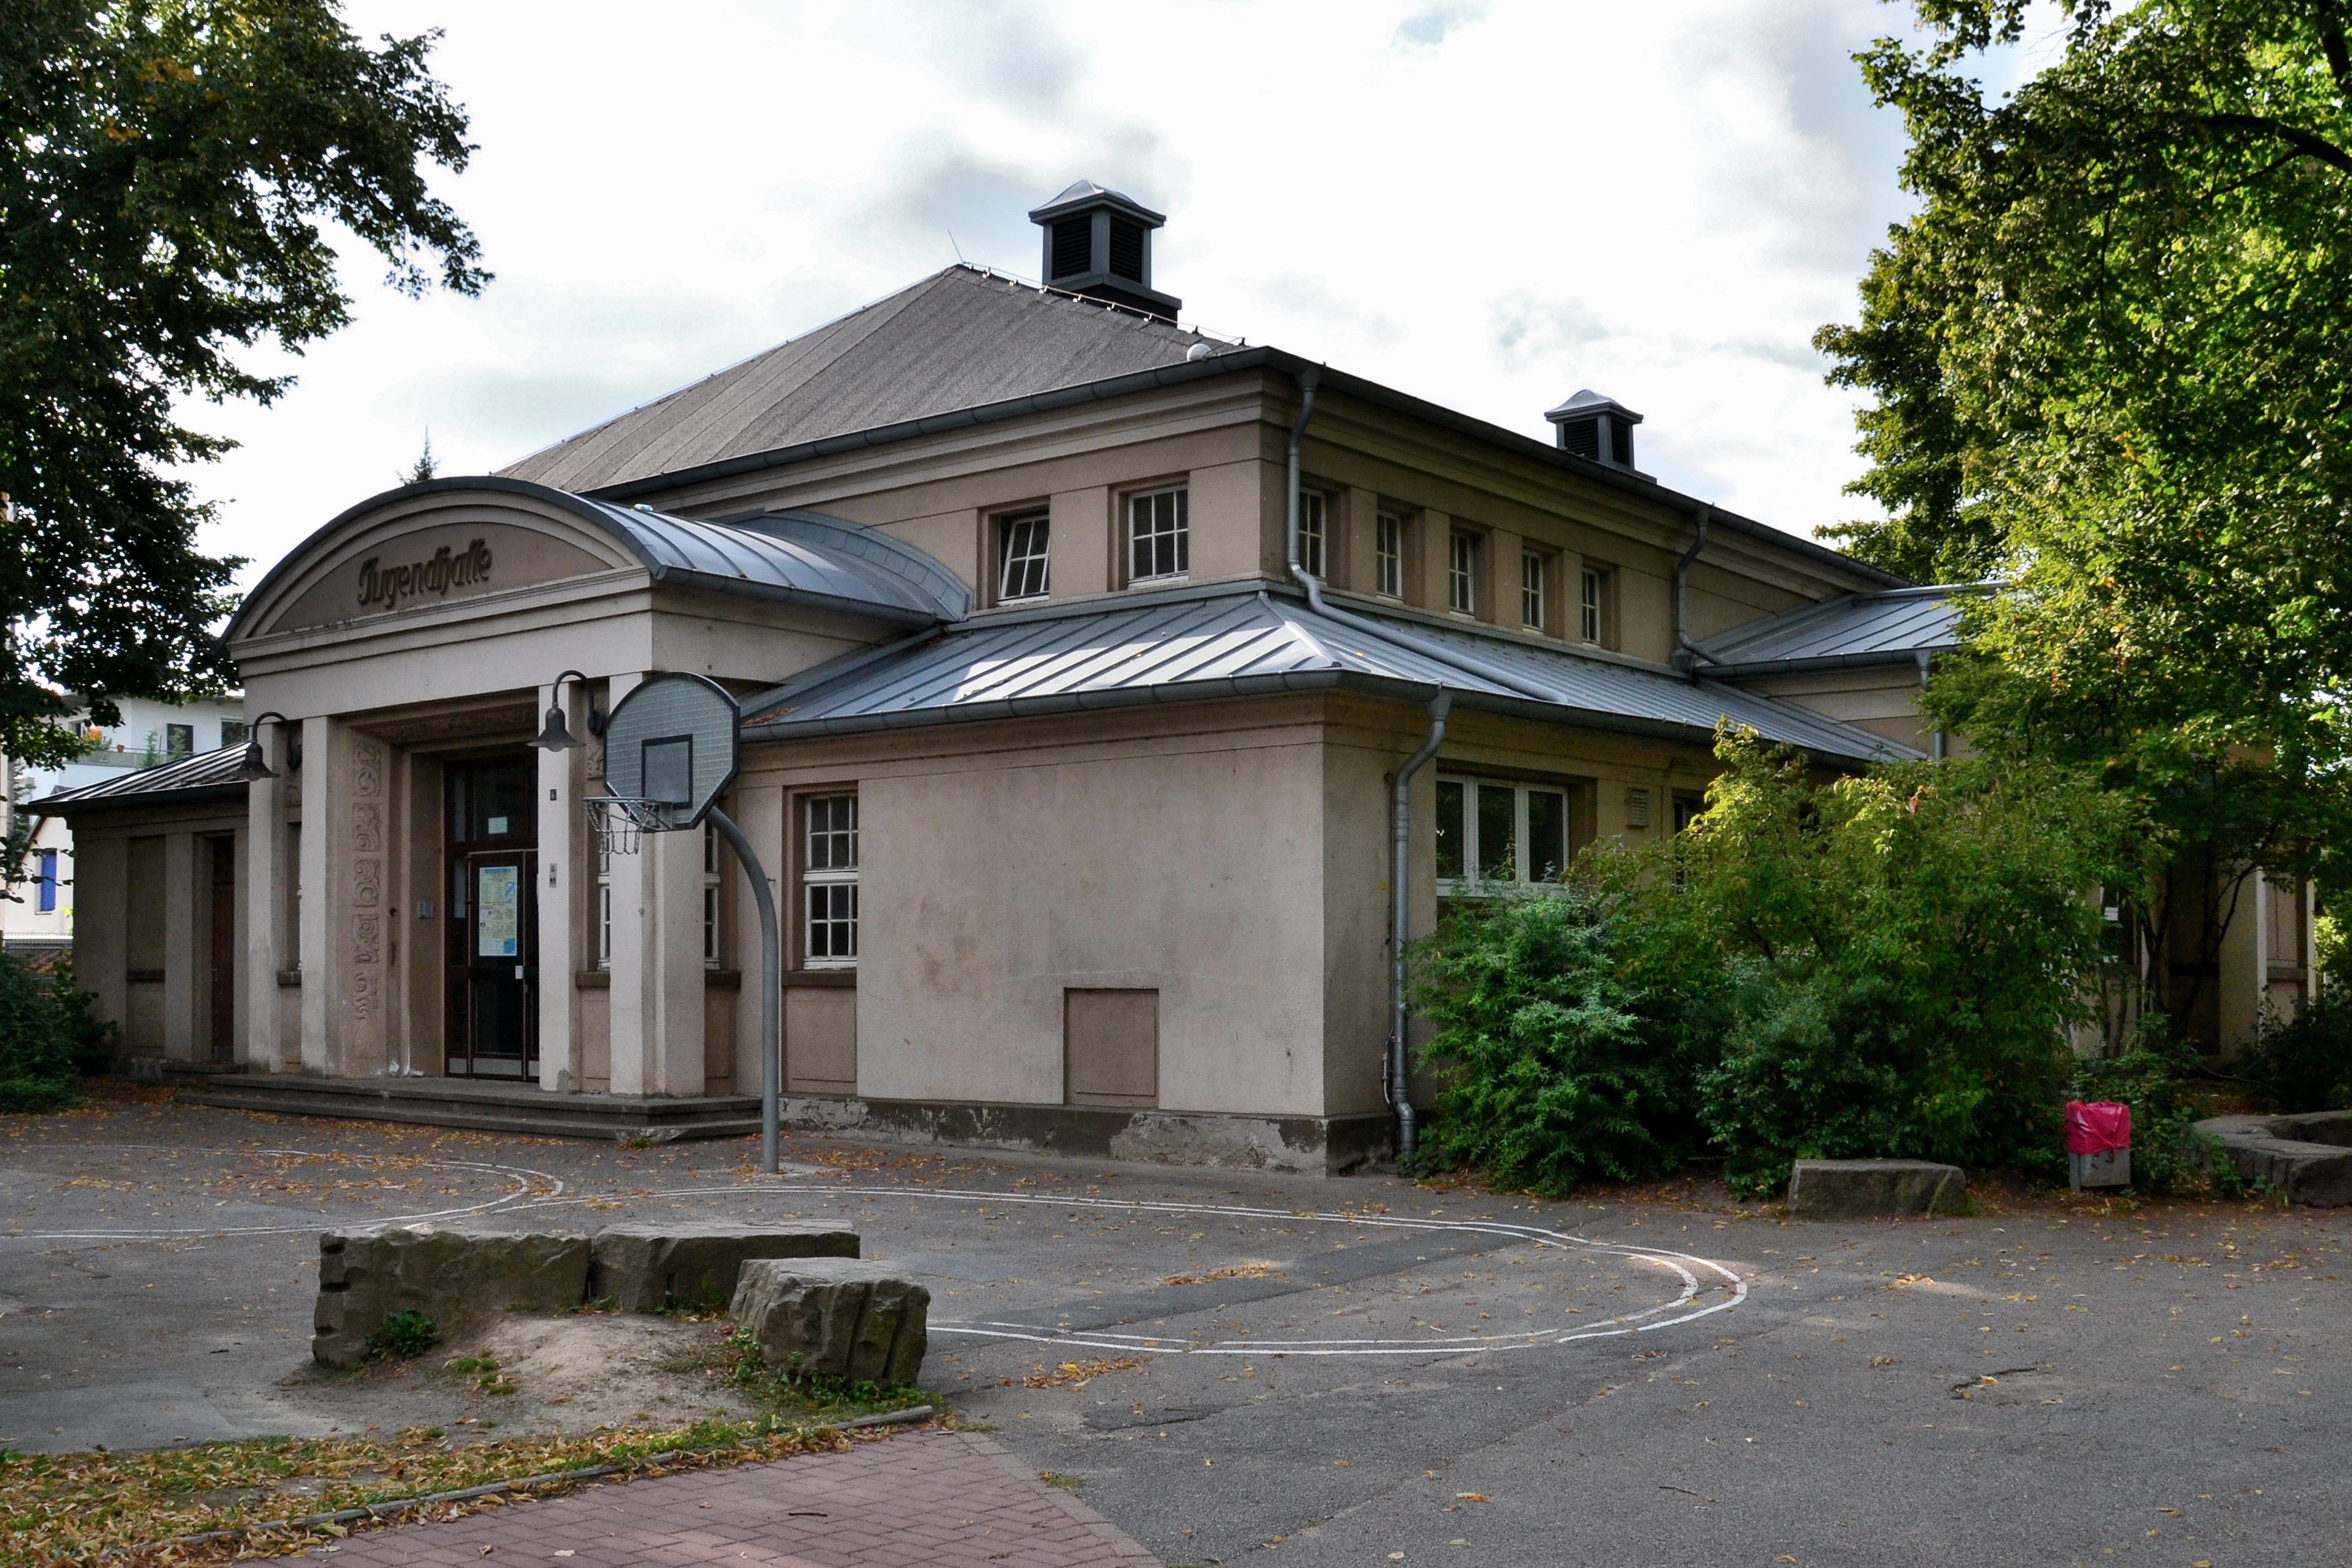 Datei:Essen, Jugendhalle Heisingen.jpg – Wikipedia